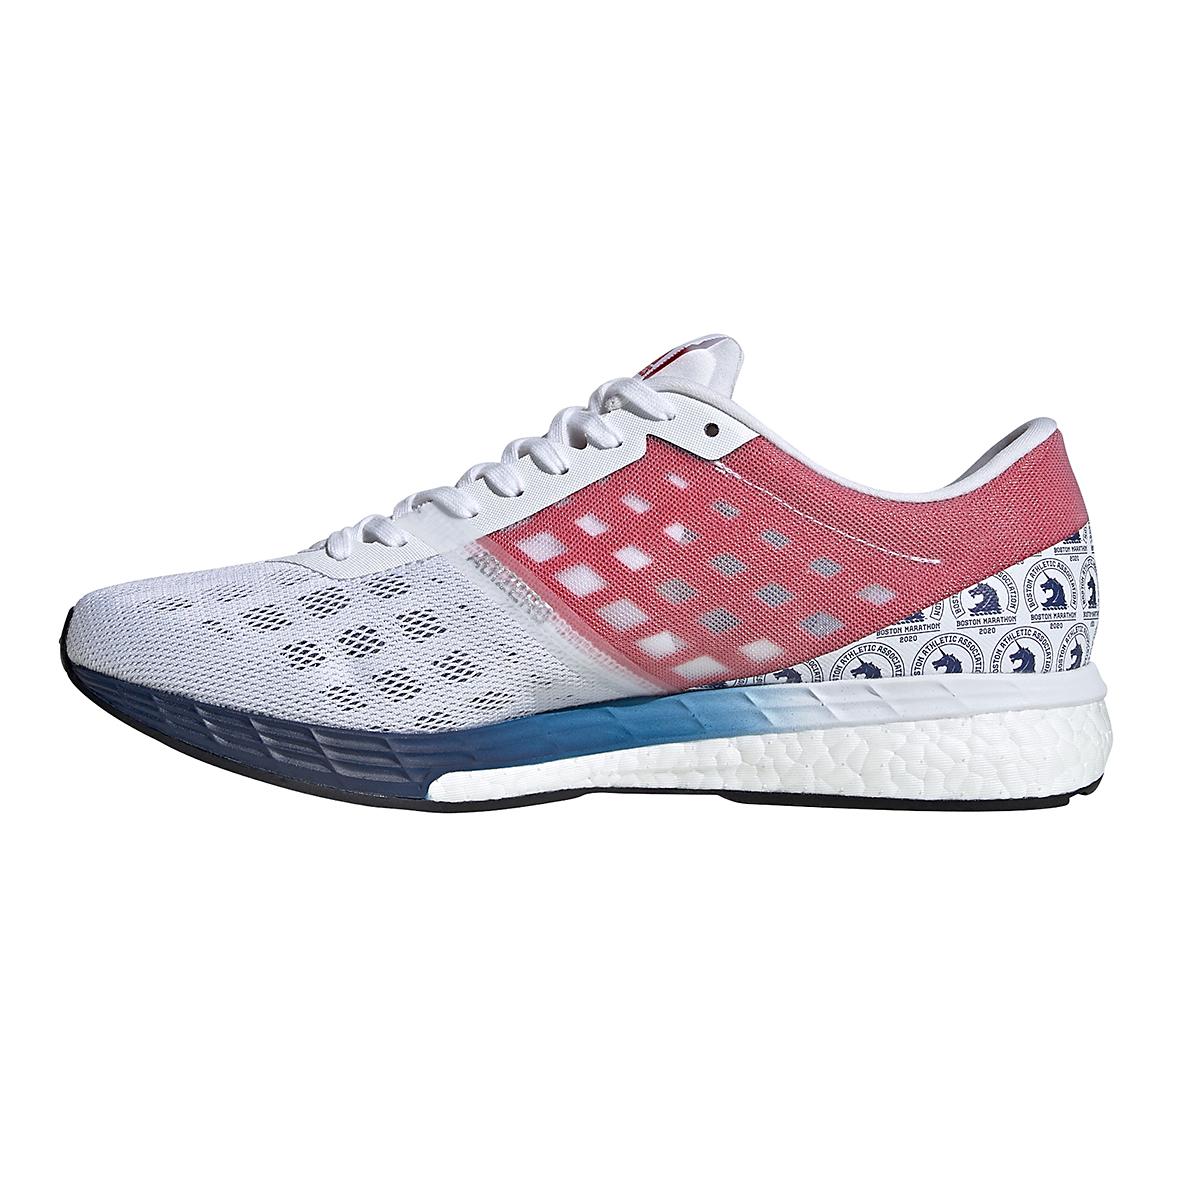 Men's Adidas Adizero Boston 9 Running Shoe - Color: Cloud White/Silver Metallic/Scarlet - Size: 8 - Width: Regular, Cloud White/Silver Metallic/Scarlet, large, image 2